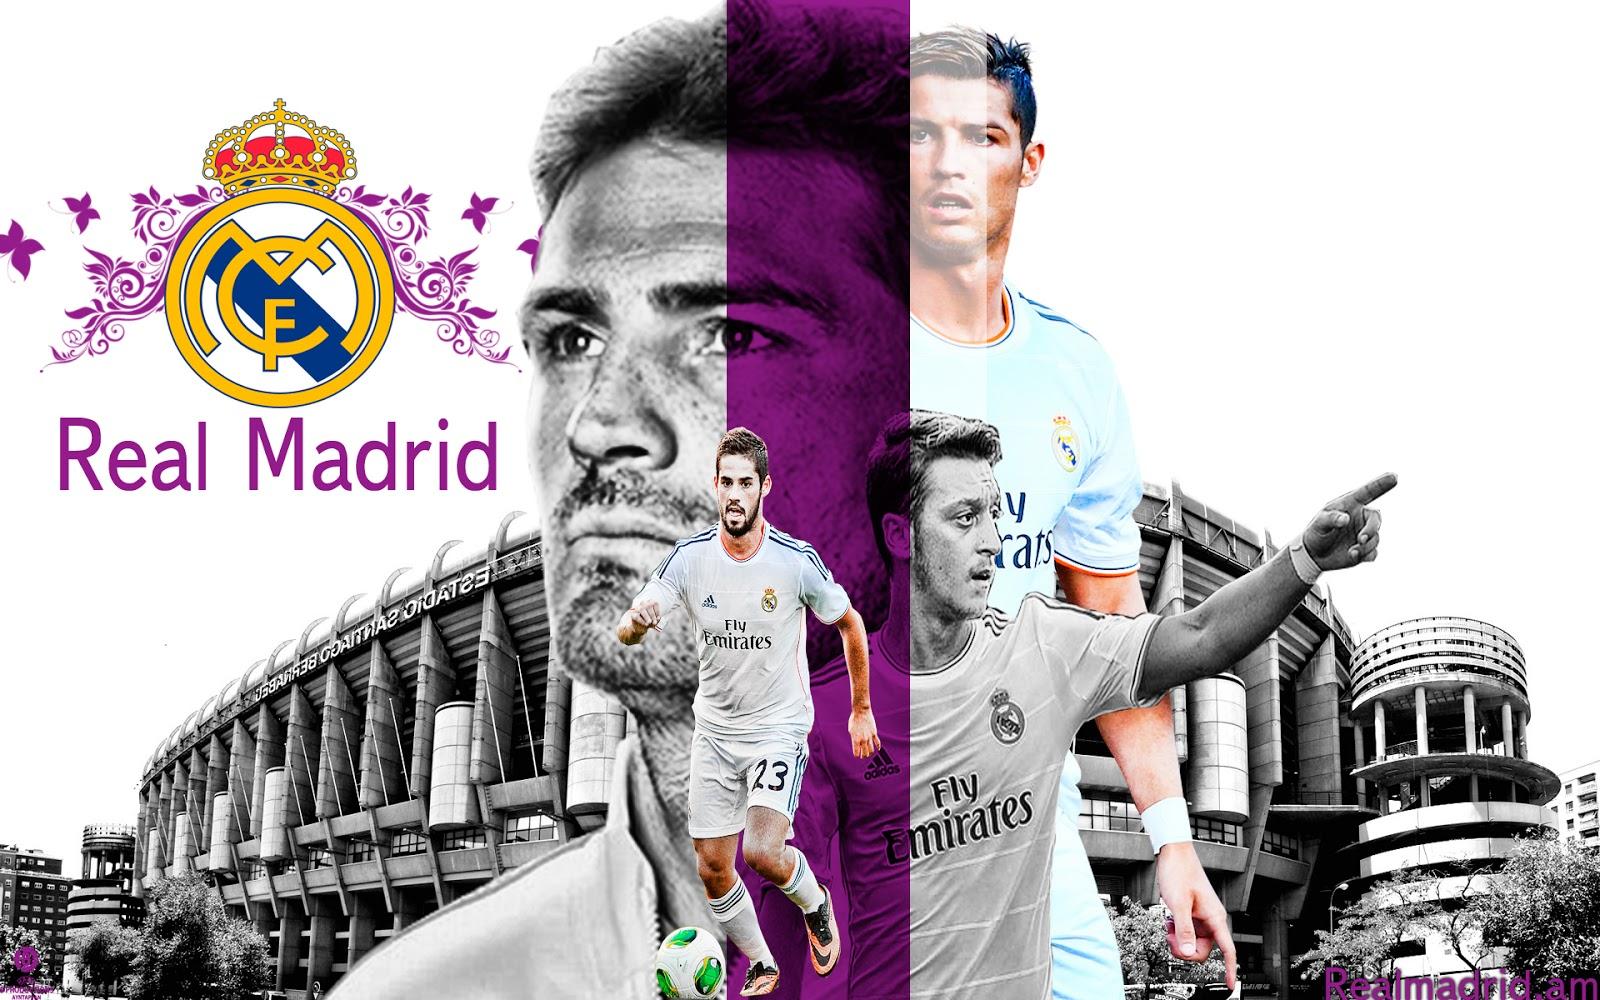 Real Madrid 2013/14 wallpaper